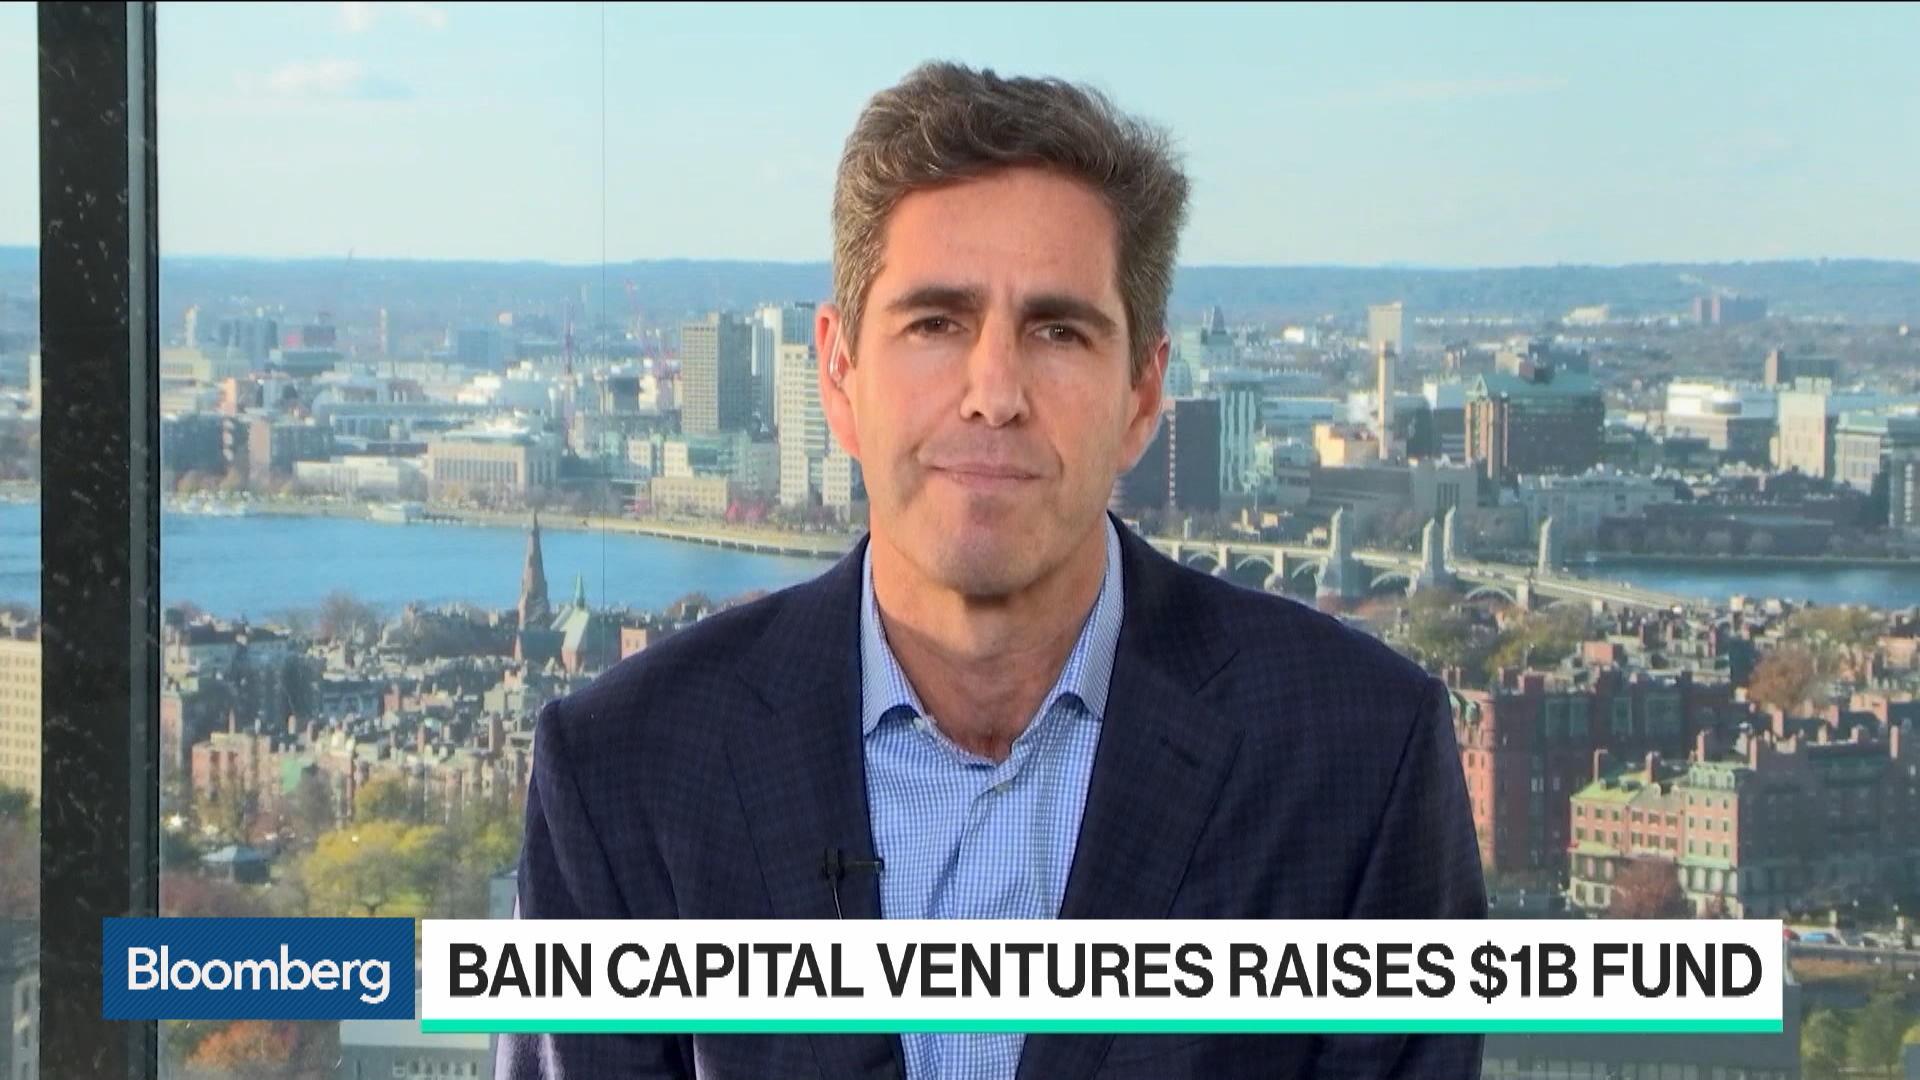 Bain Capital Ventures Raises $1 Billion Fund, Its Biggest